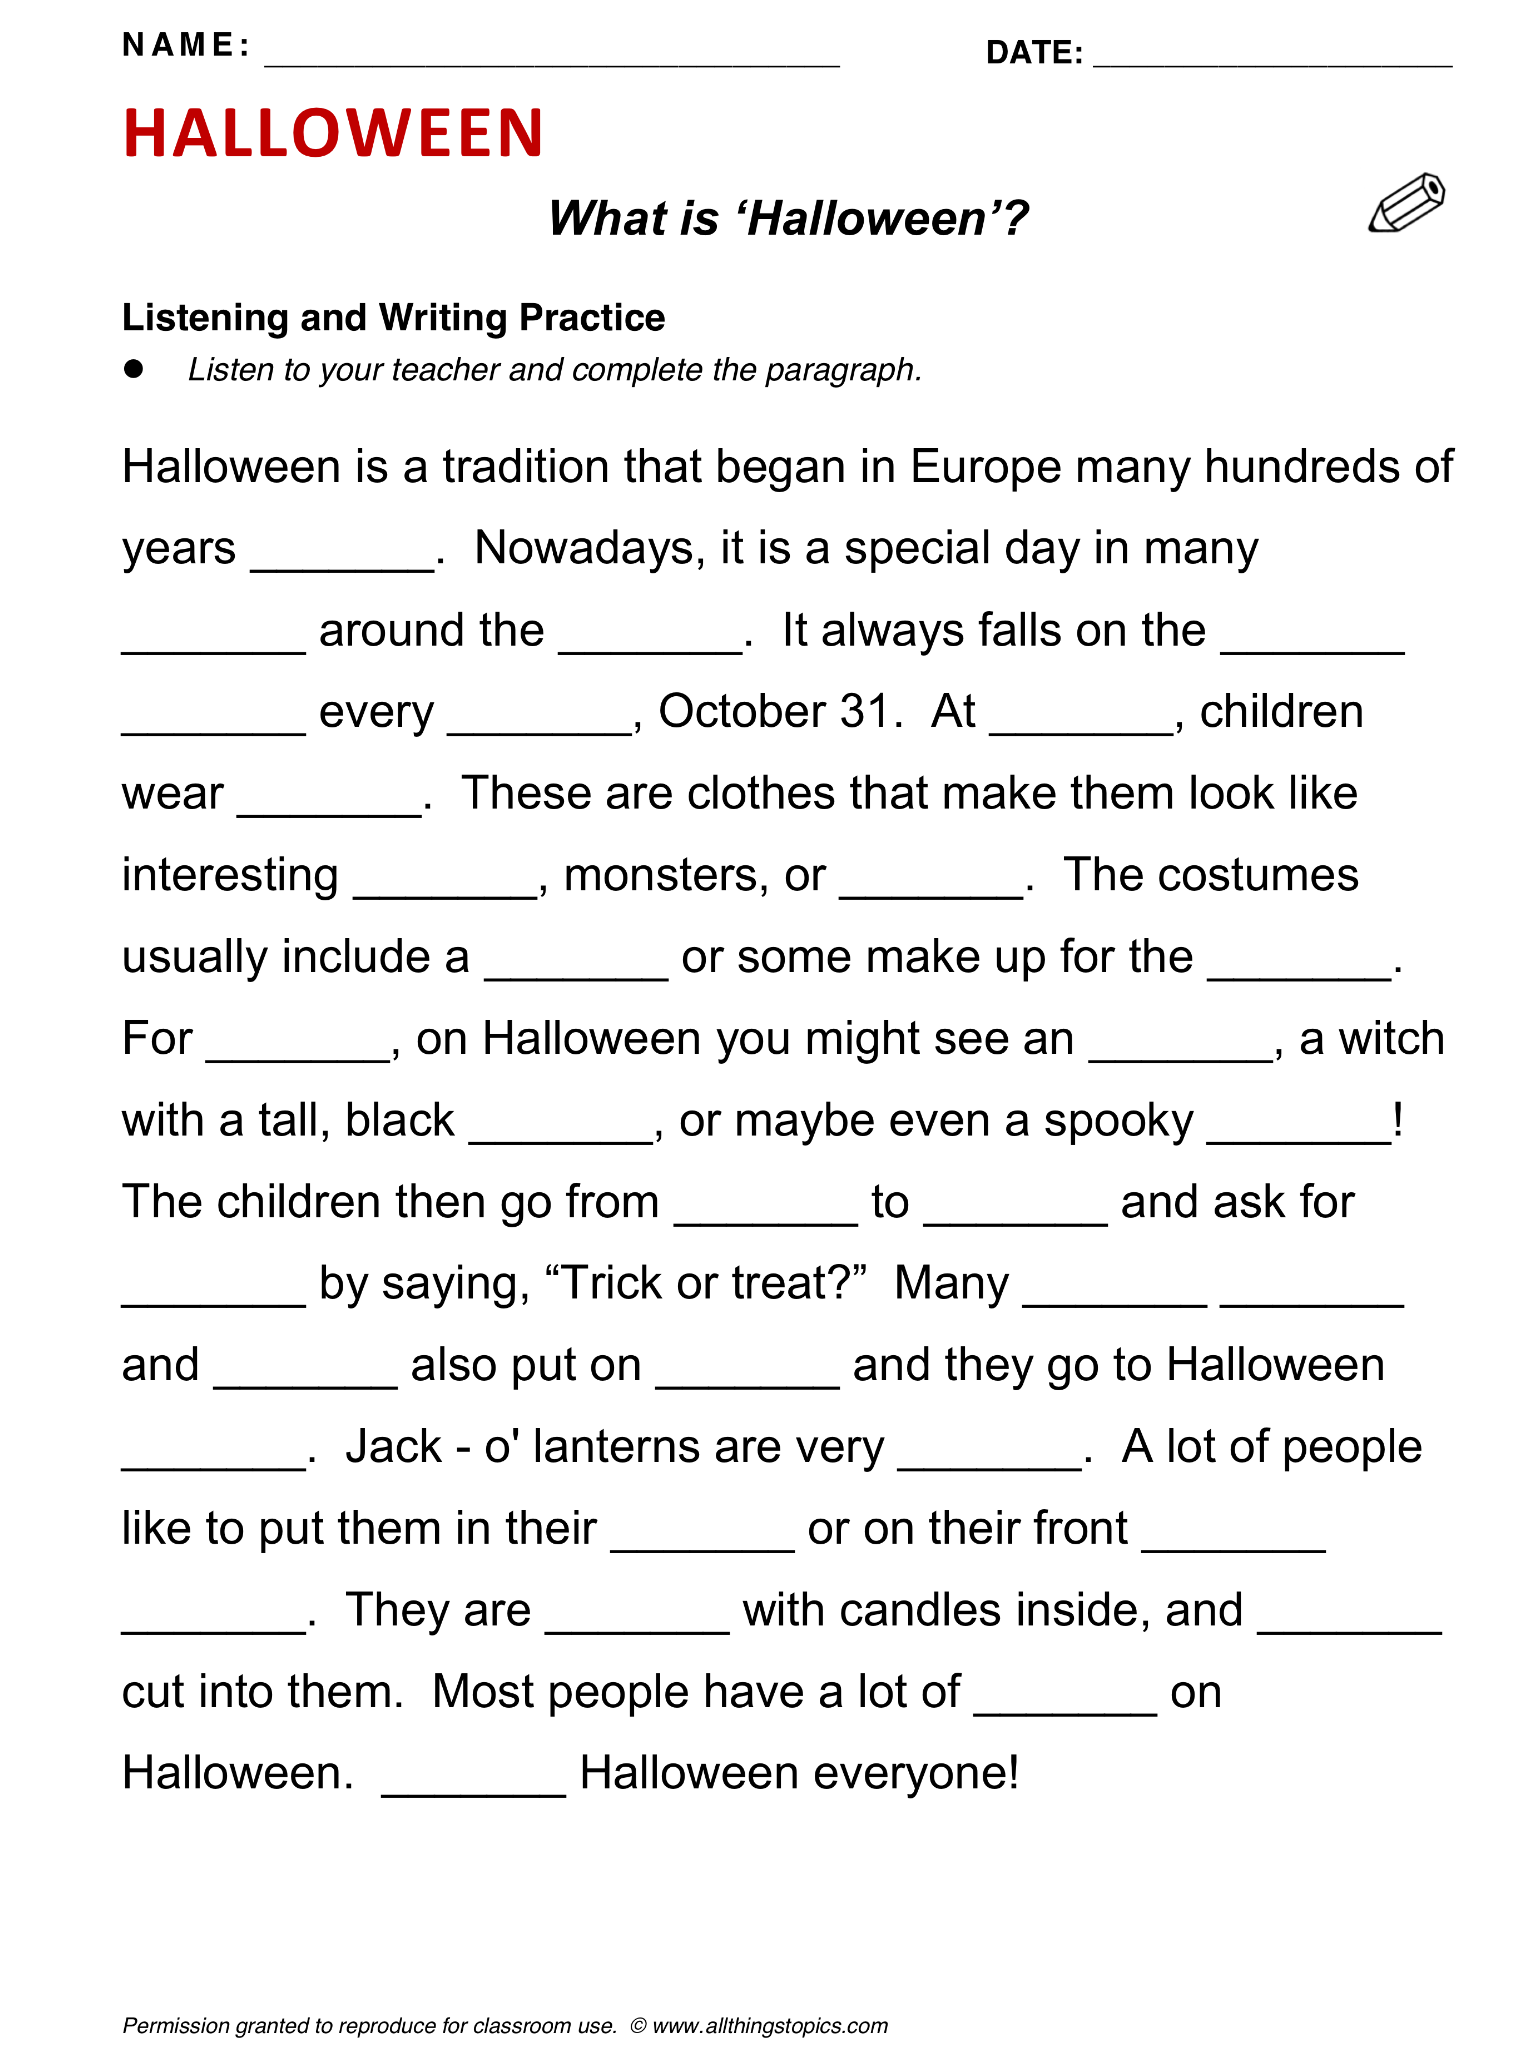 Halloween English Learning English Vocabulary Esl English Phrases Http Www Allthingstopics Com Halloween Learn English English Phrases Teaching English [ 2048 x 1536 Pixel ]